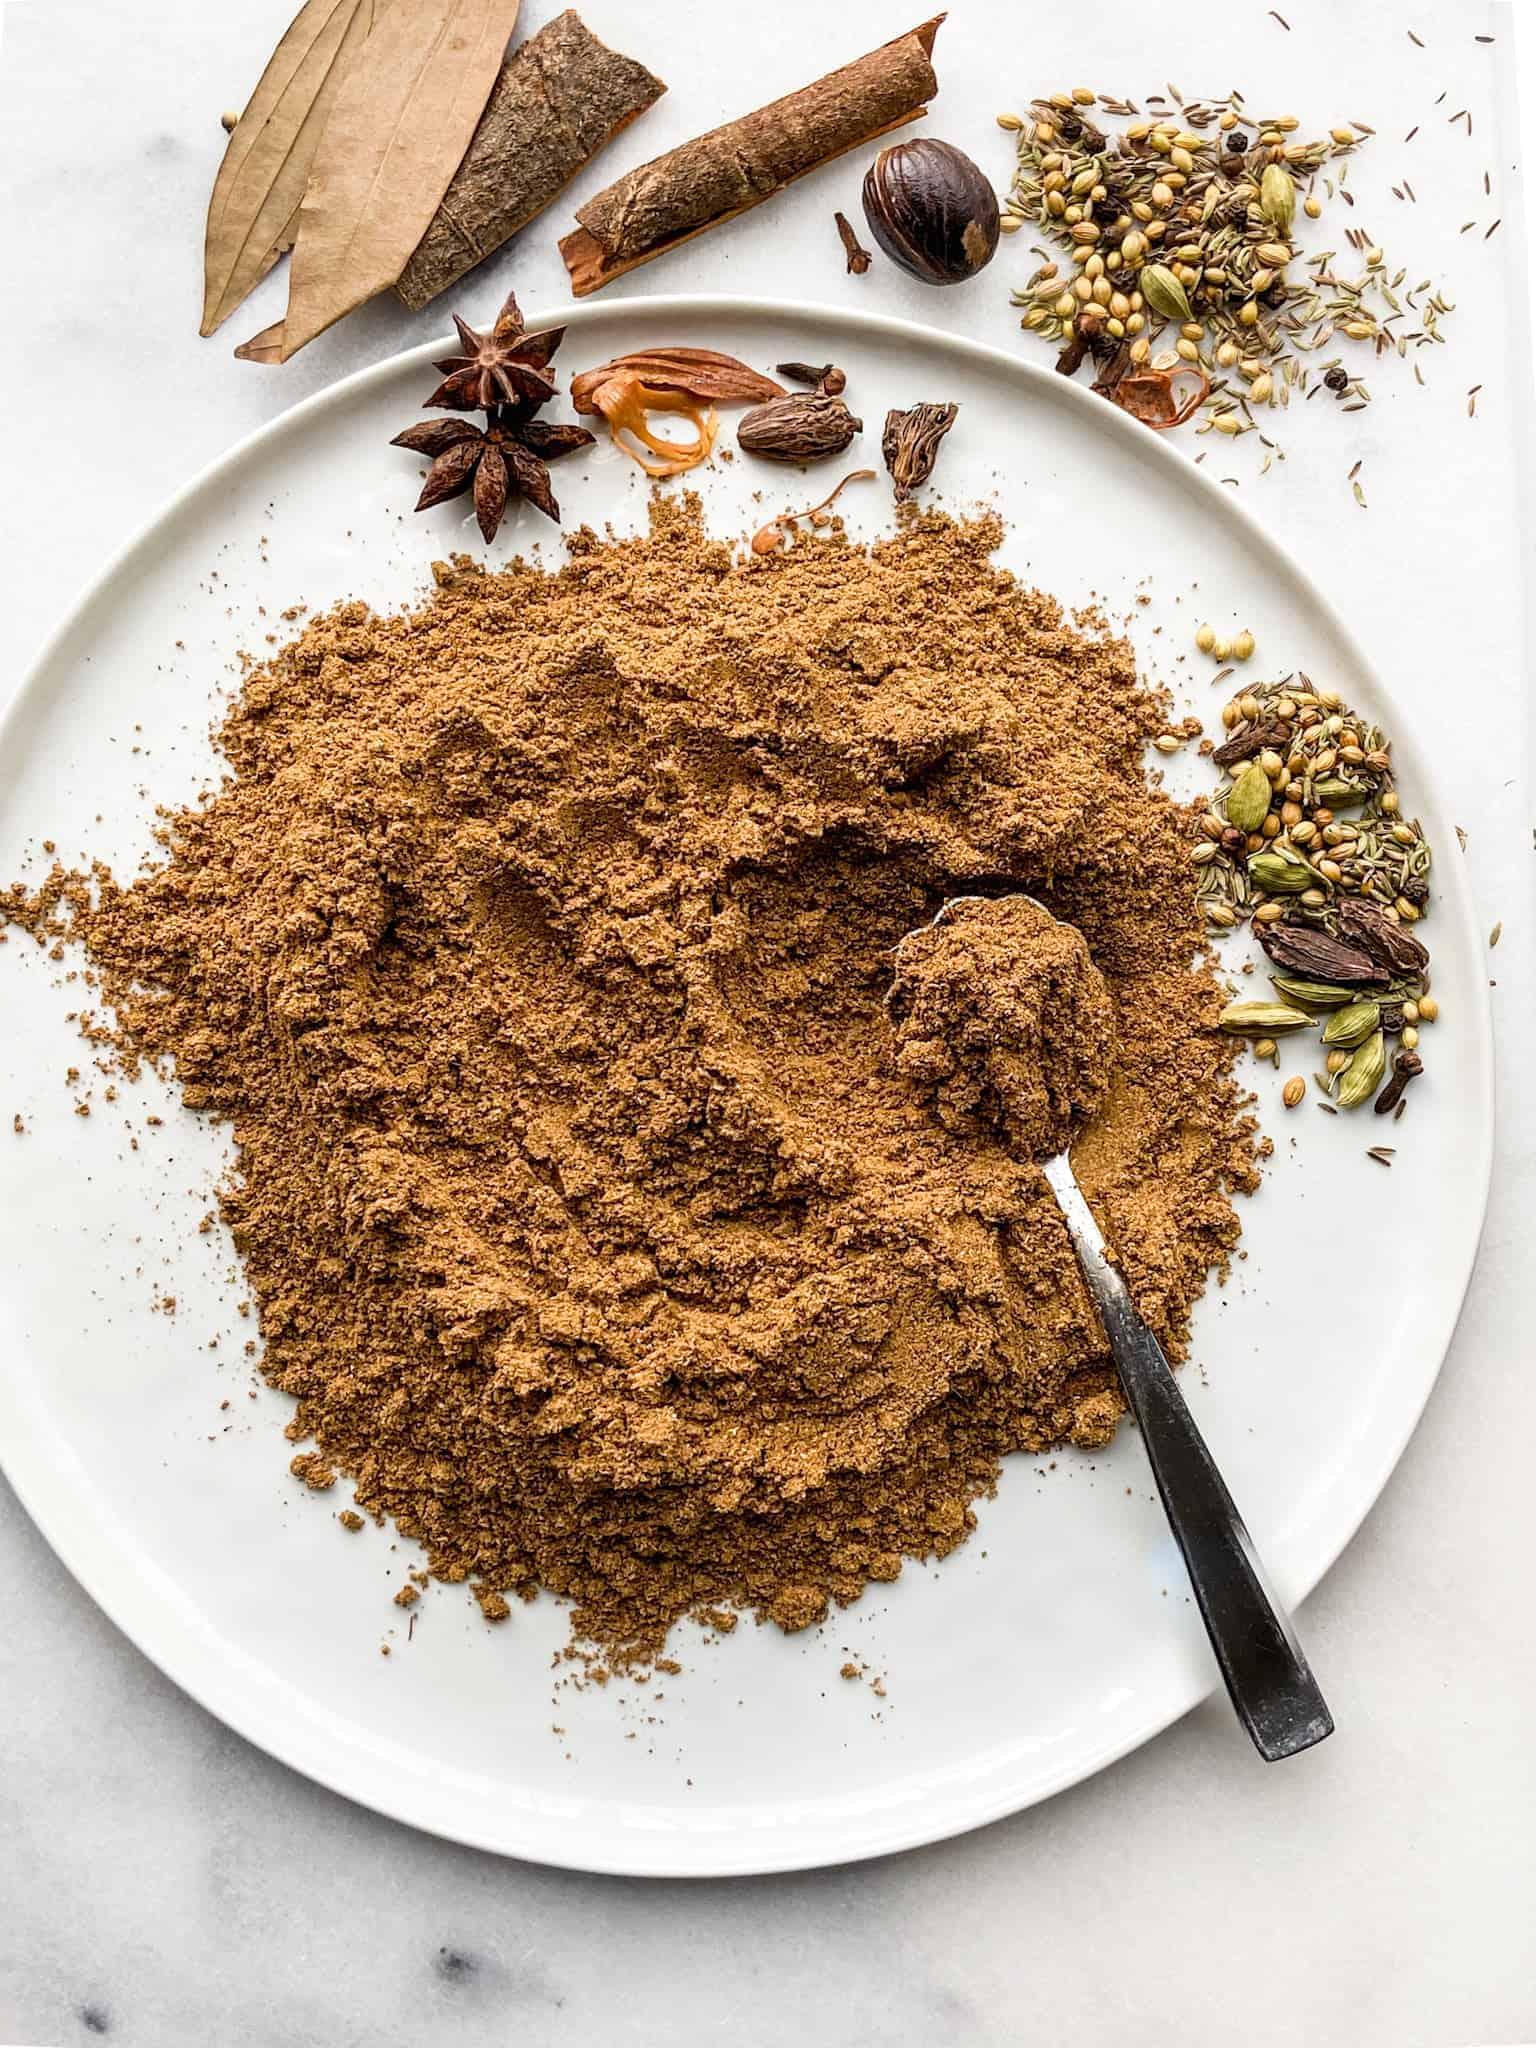 Biryani Masala Recipe-How to Make Biryani Masala